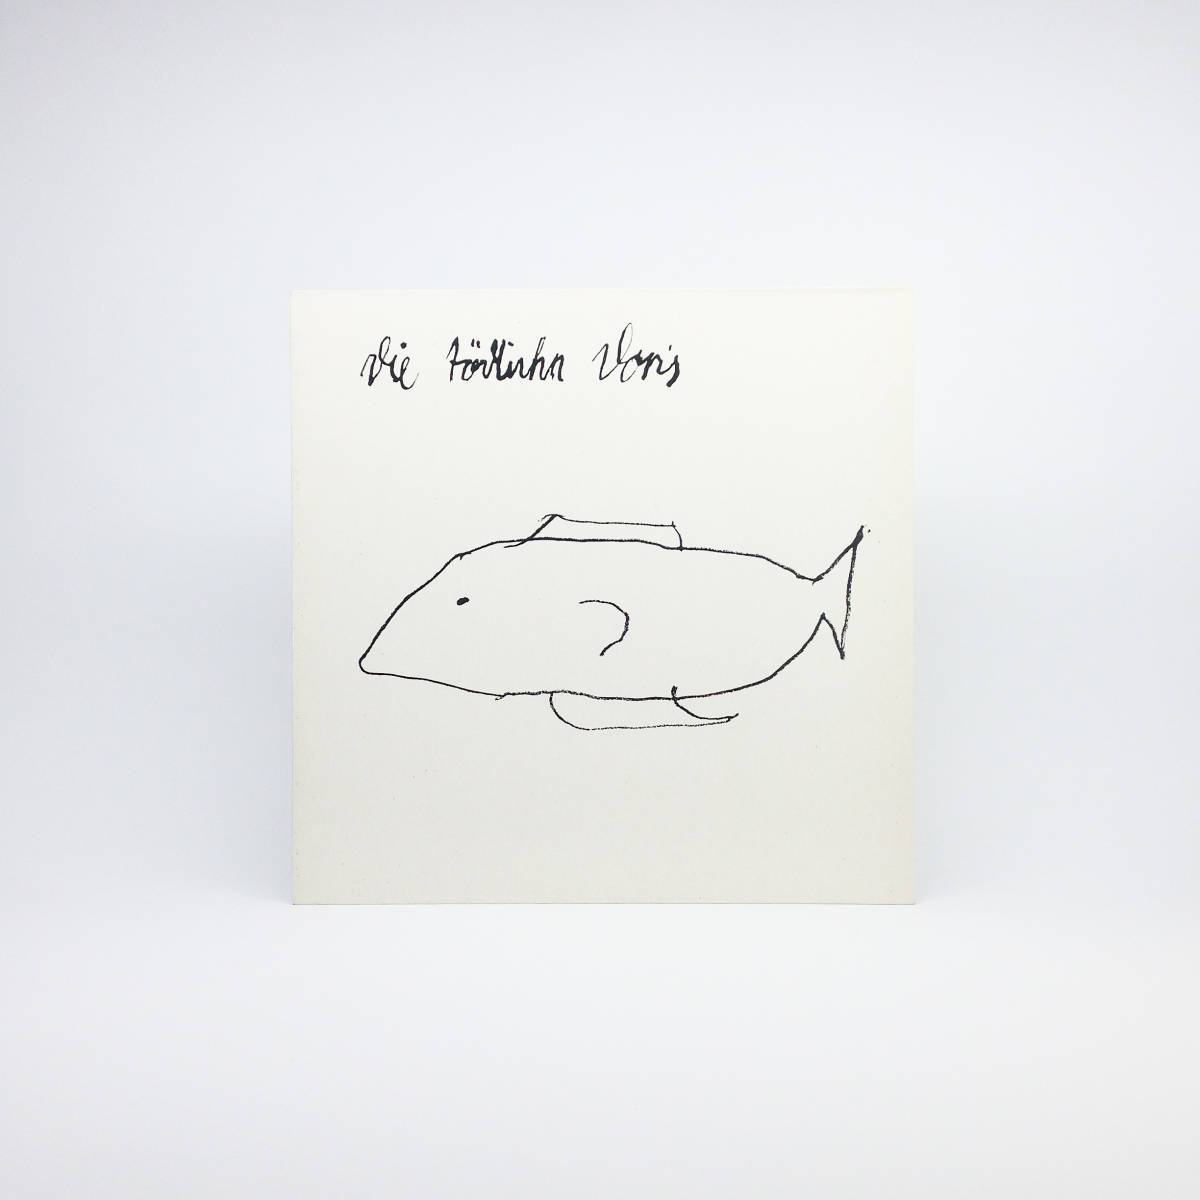 [LP] '81独Orig / Zickzack / 72048 / Die Todliche Doris / Ohne Titel / Art Rock / Noise / Experimental / Minimal